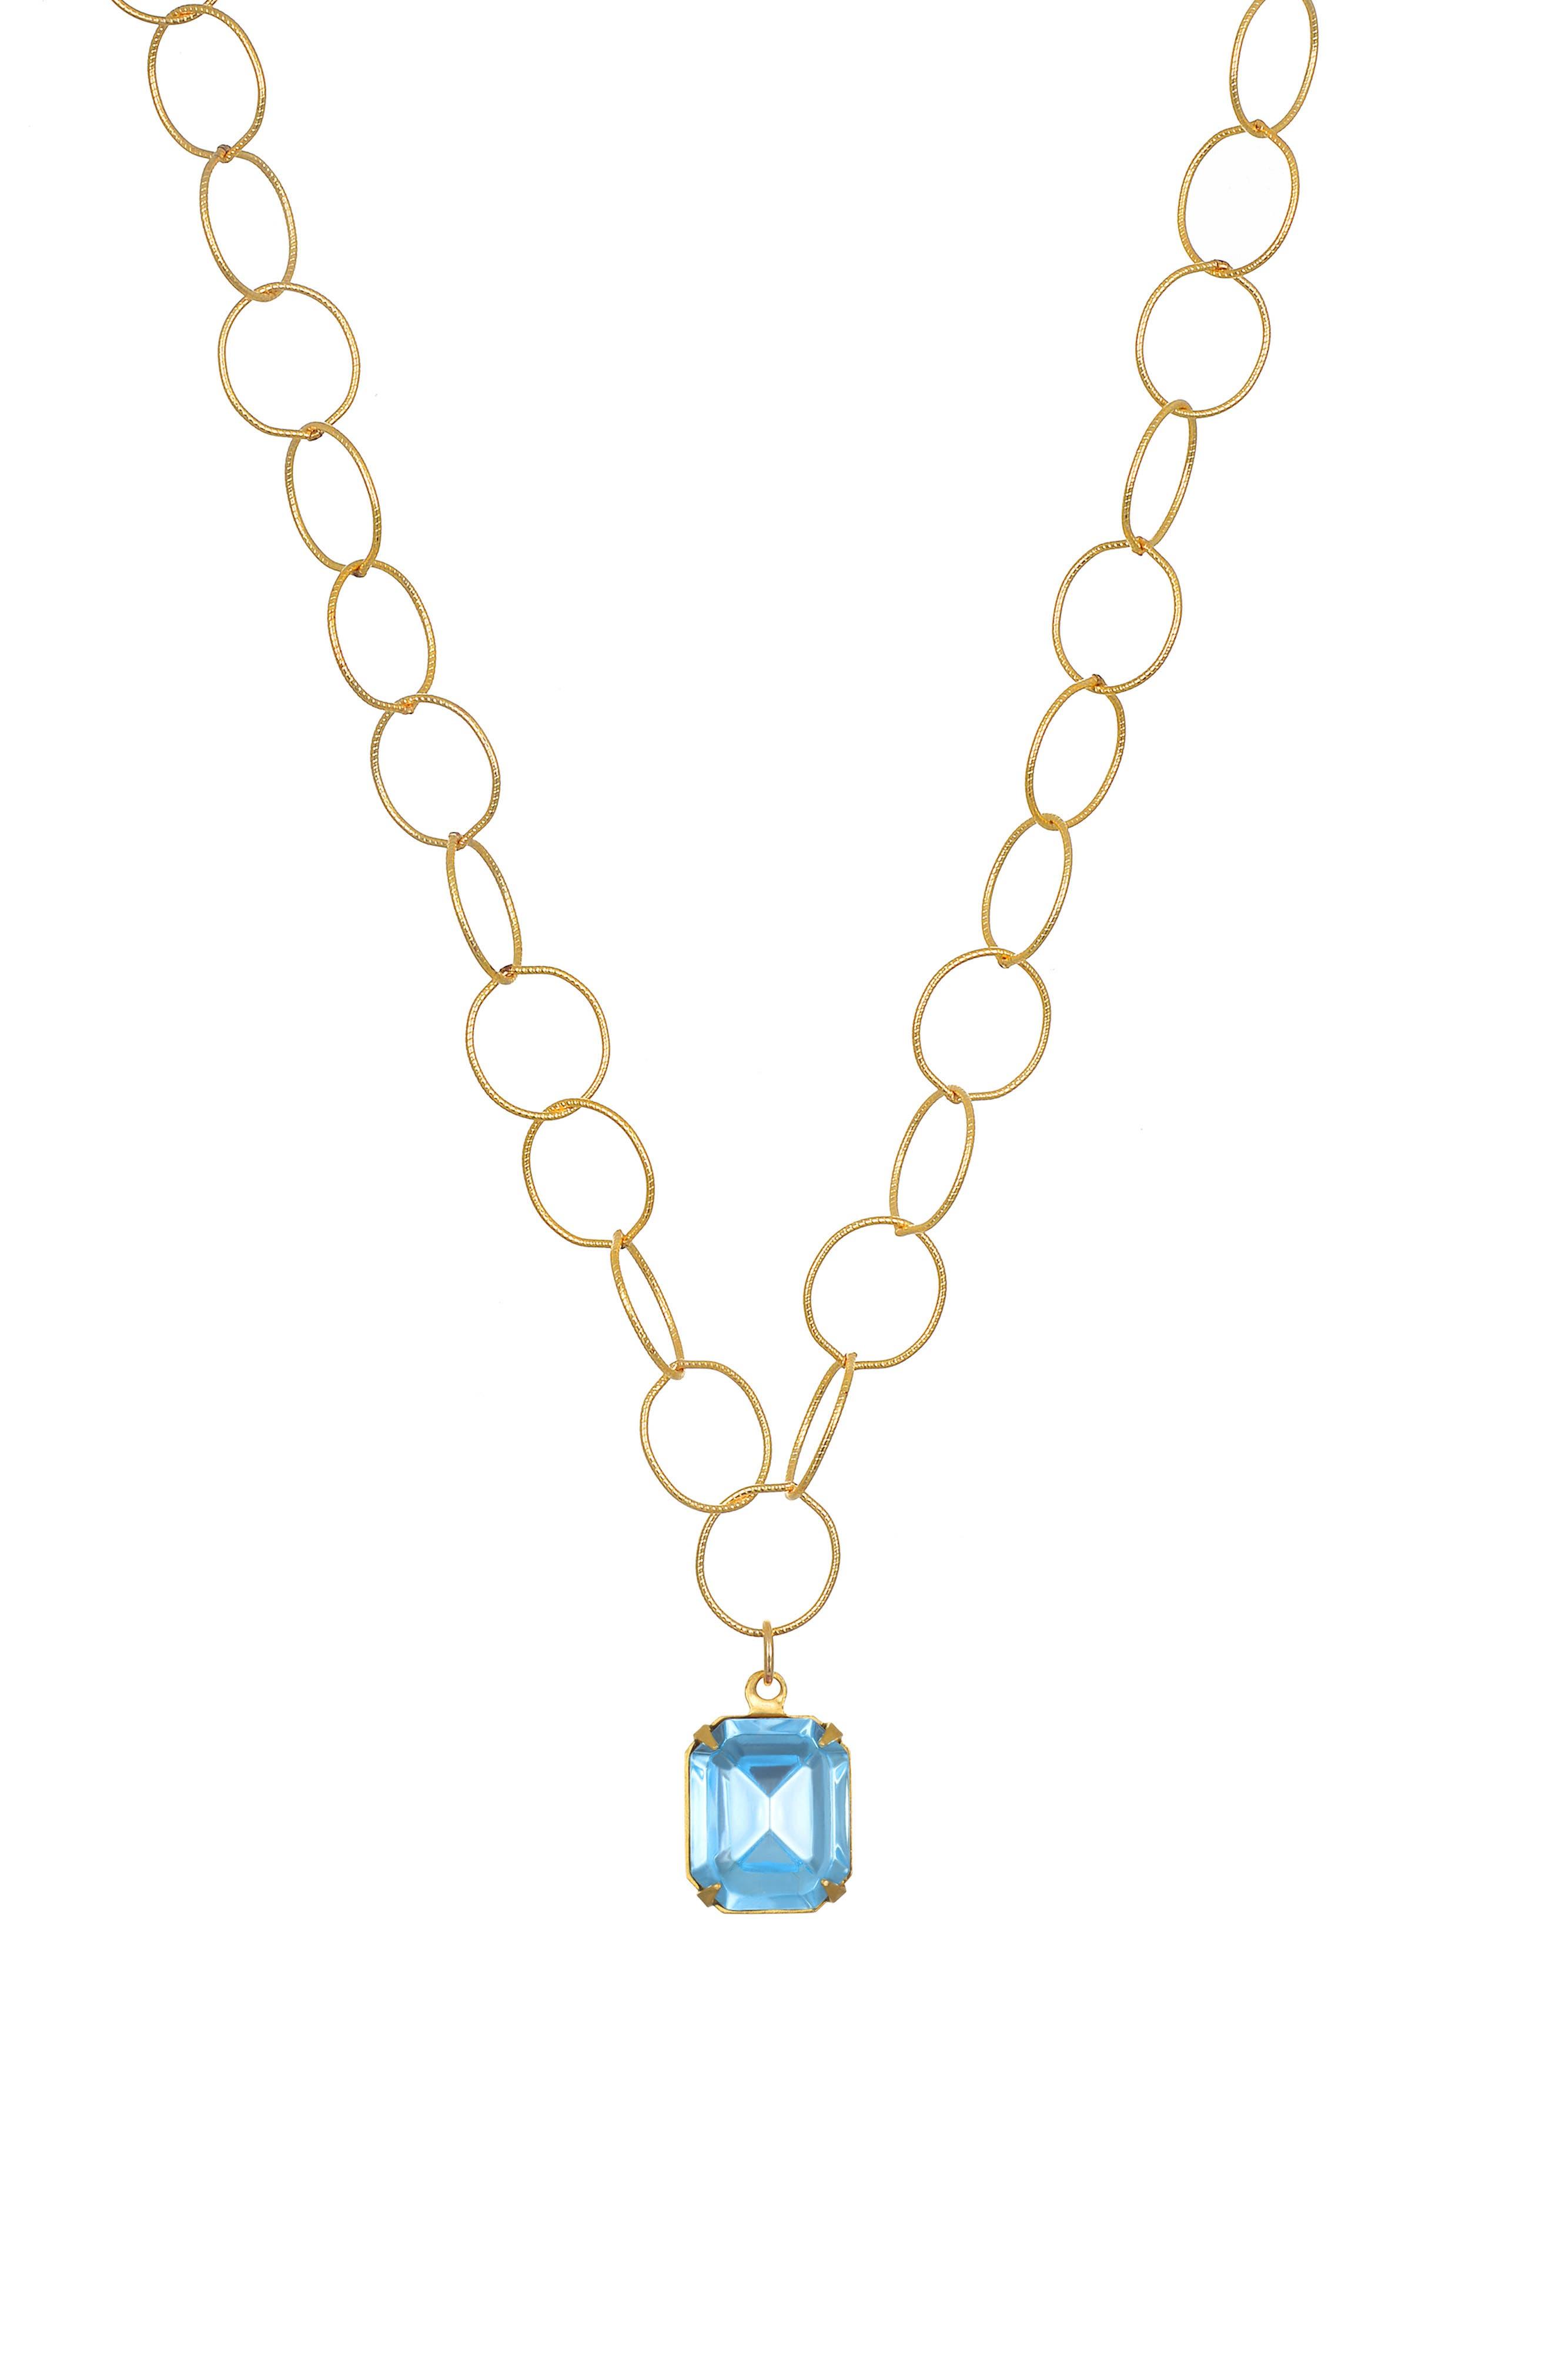 Charleston Solitaire Pendant Necklace